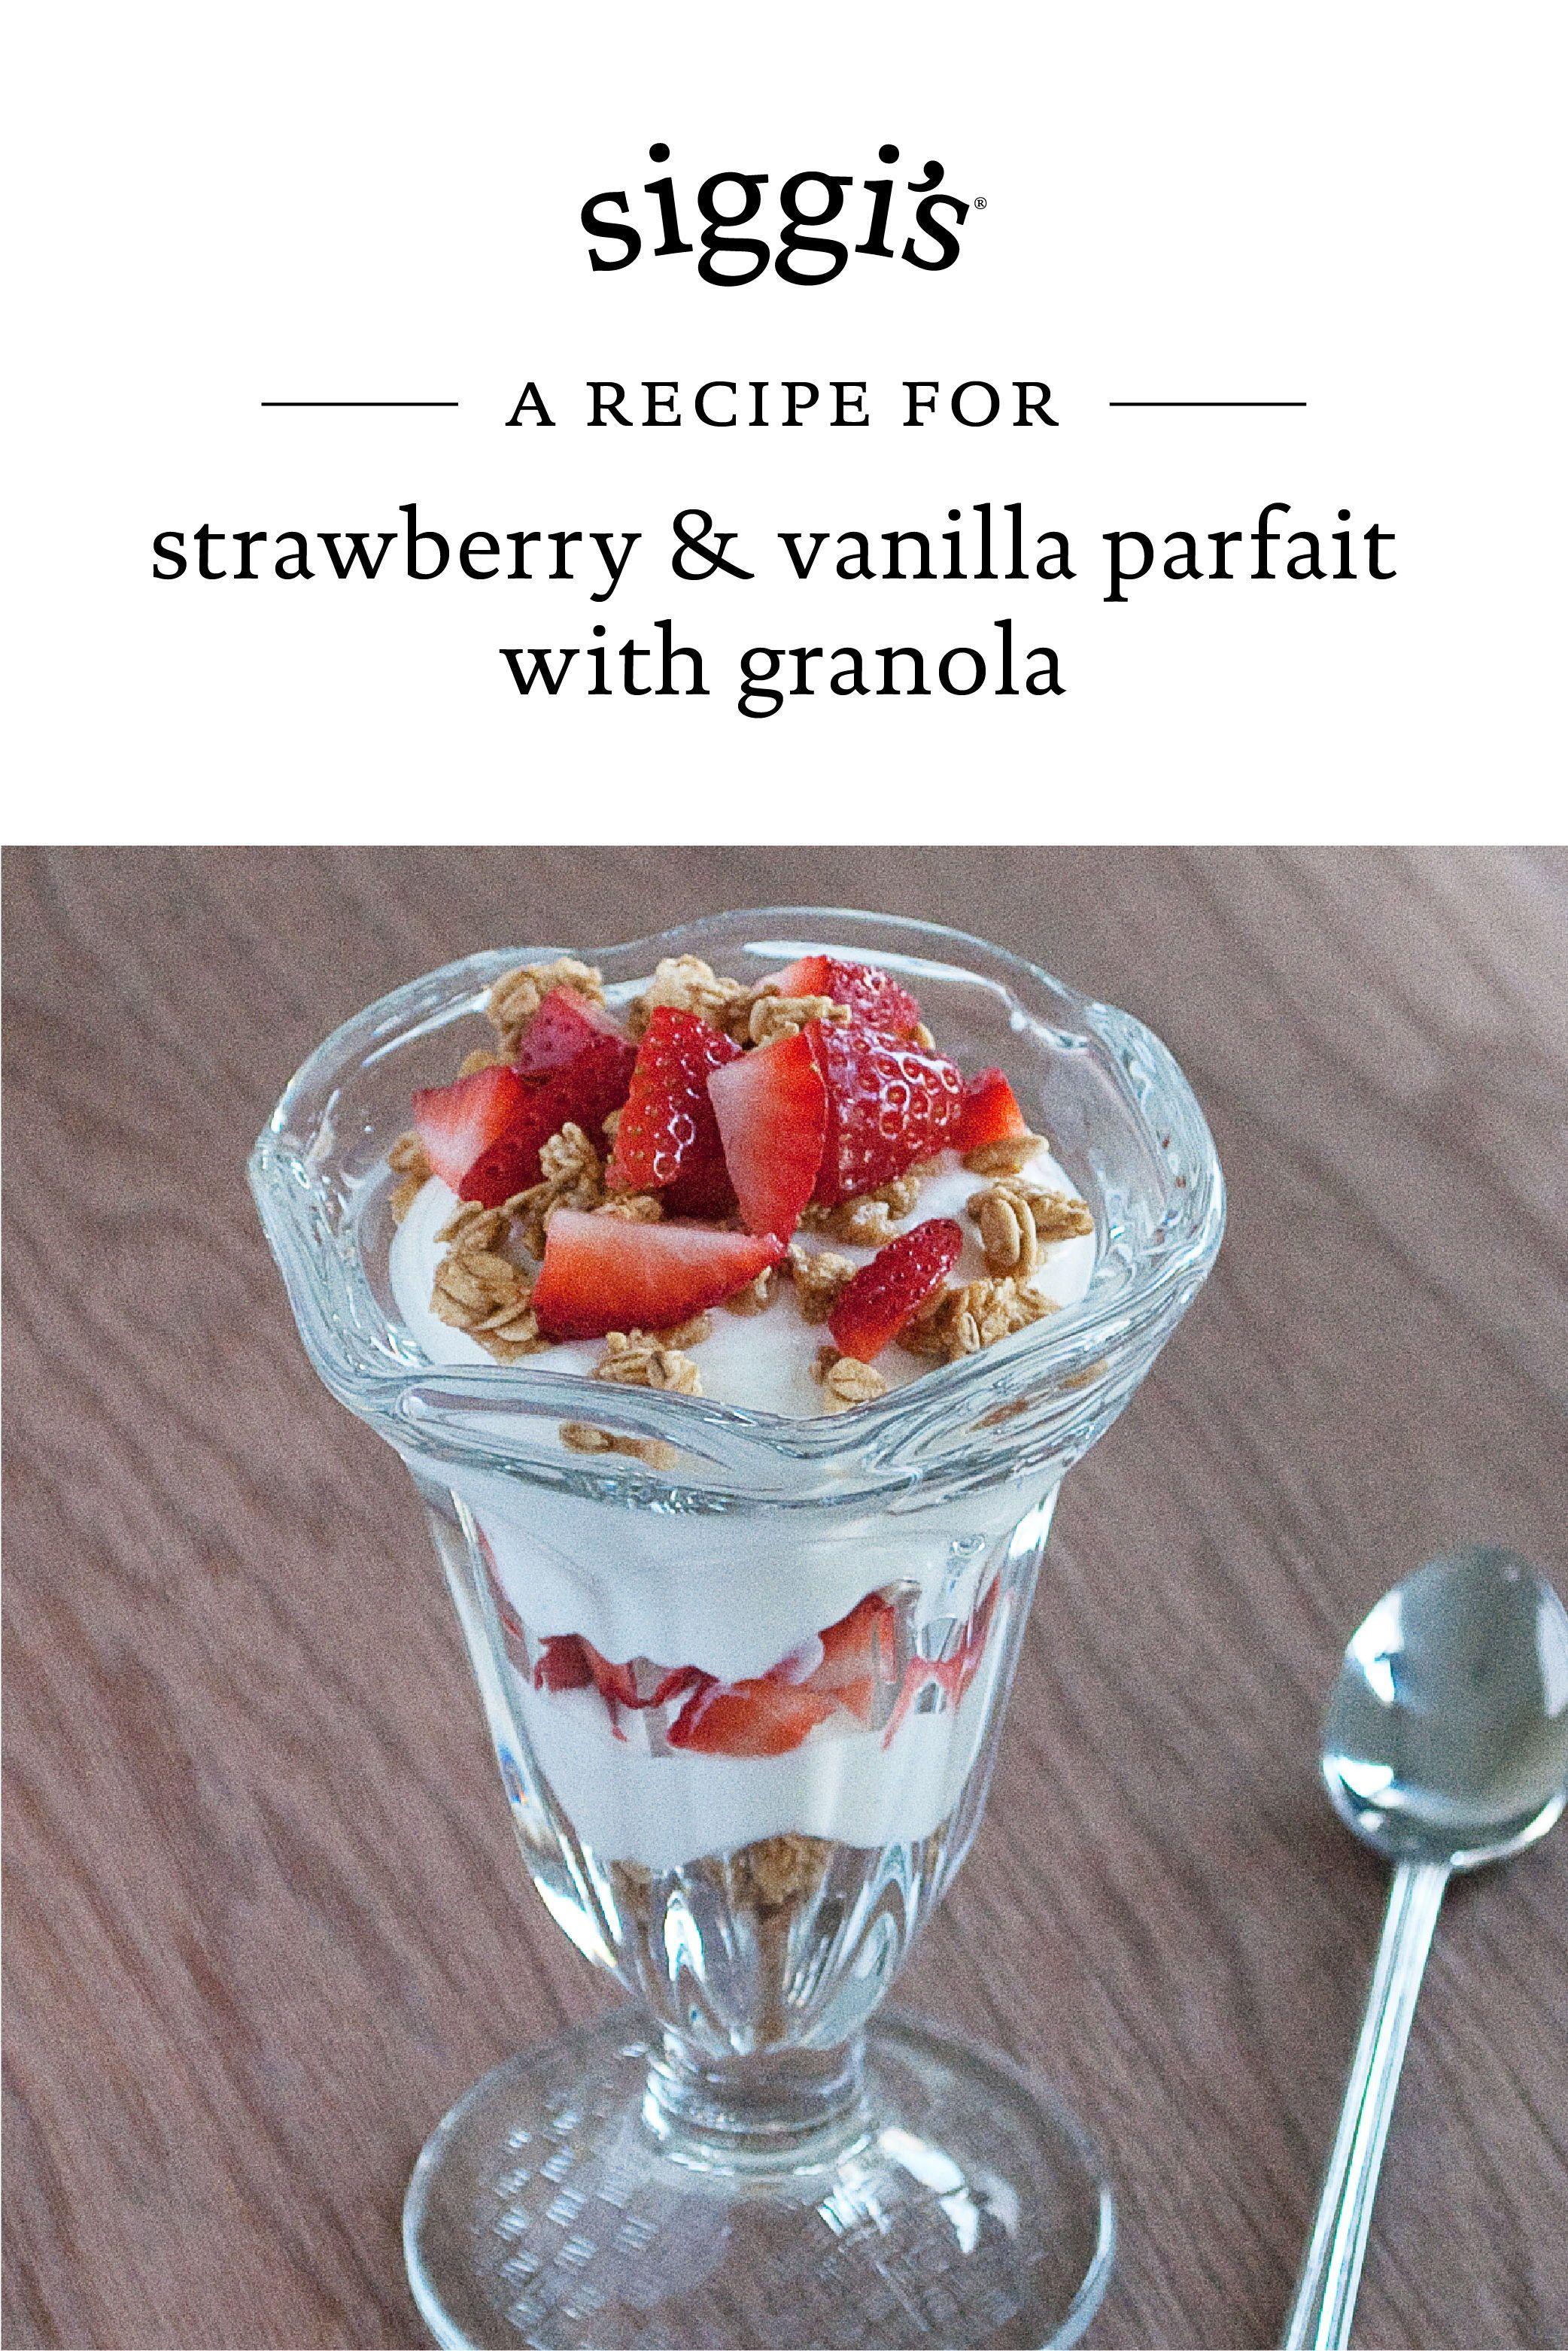 Strawberry Vanilla Parfait With Granola Strawberry Vanilla Parfait Granola Strawberry Nutrition Facts